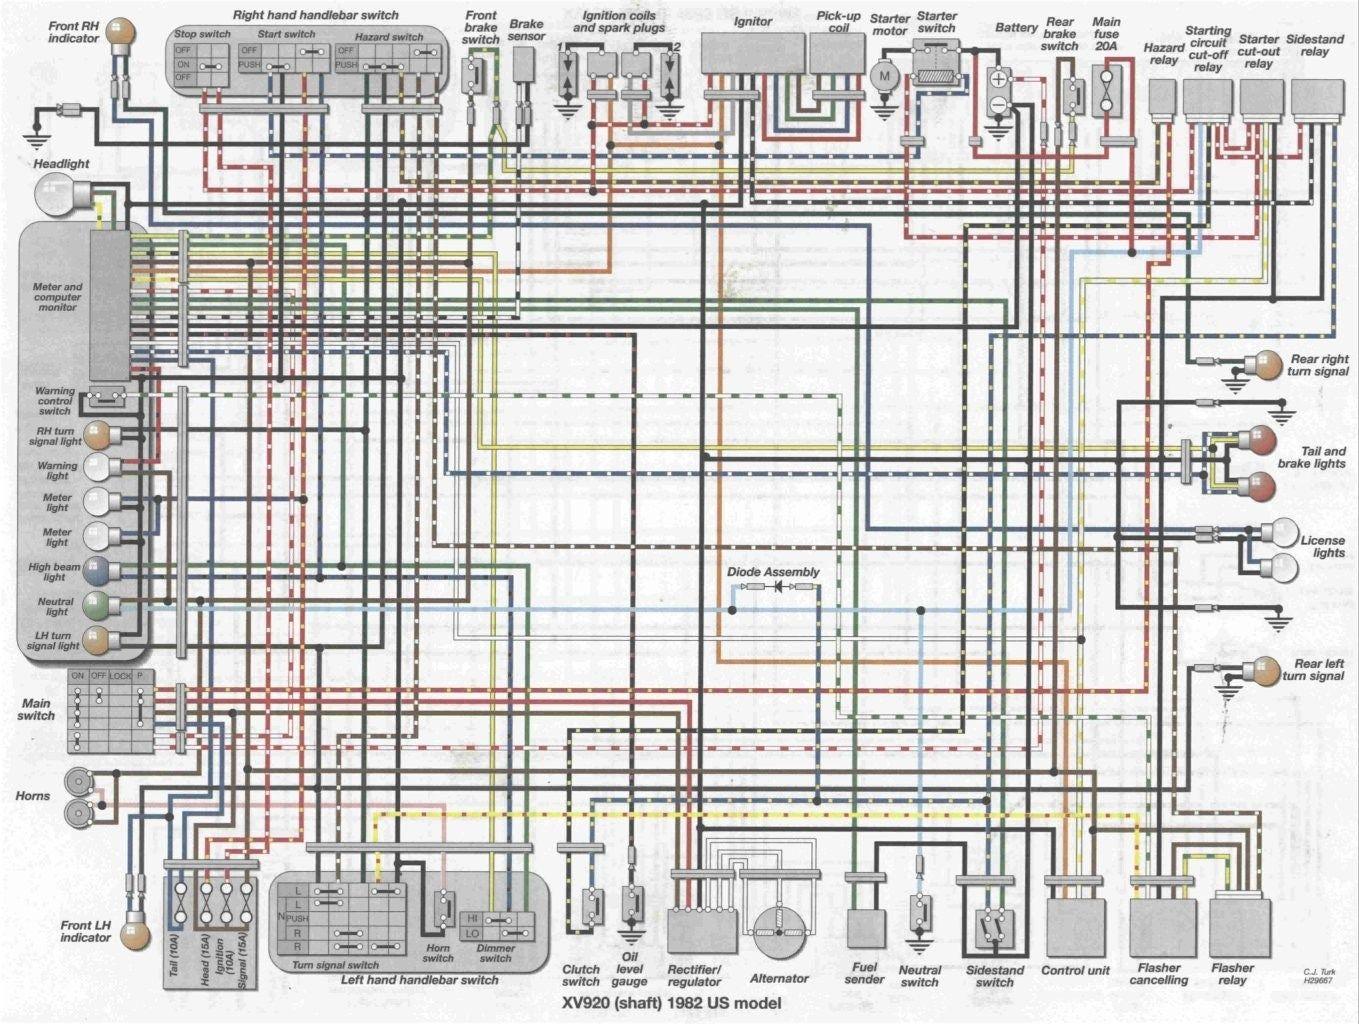 Virago Xv1000 Wiring Diagram Hammer Rail Wiring Diagram Wiring Diagram 1973 Ford 4000 Tractor